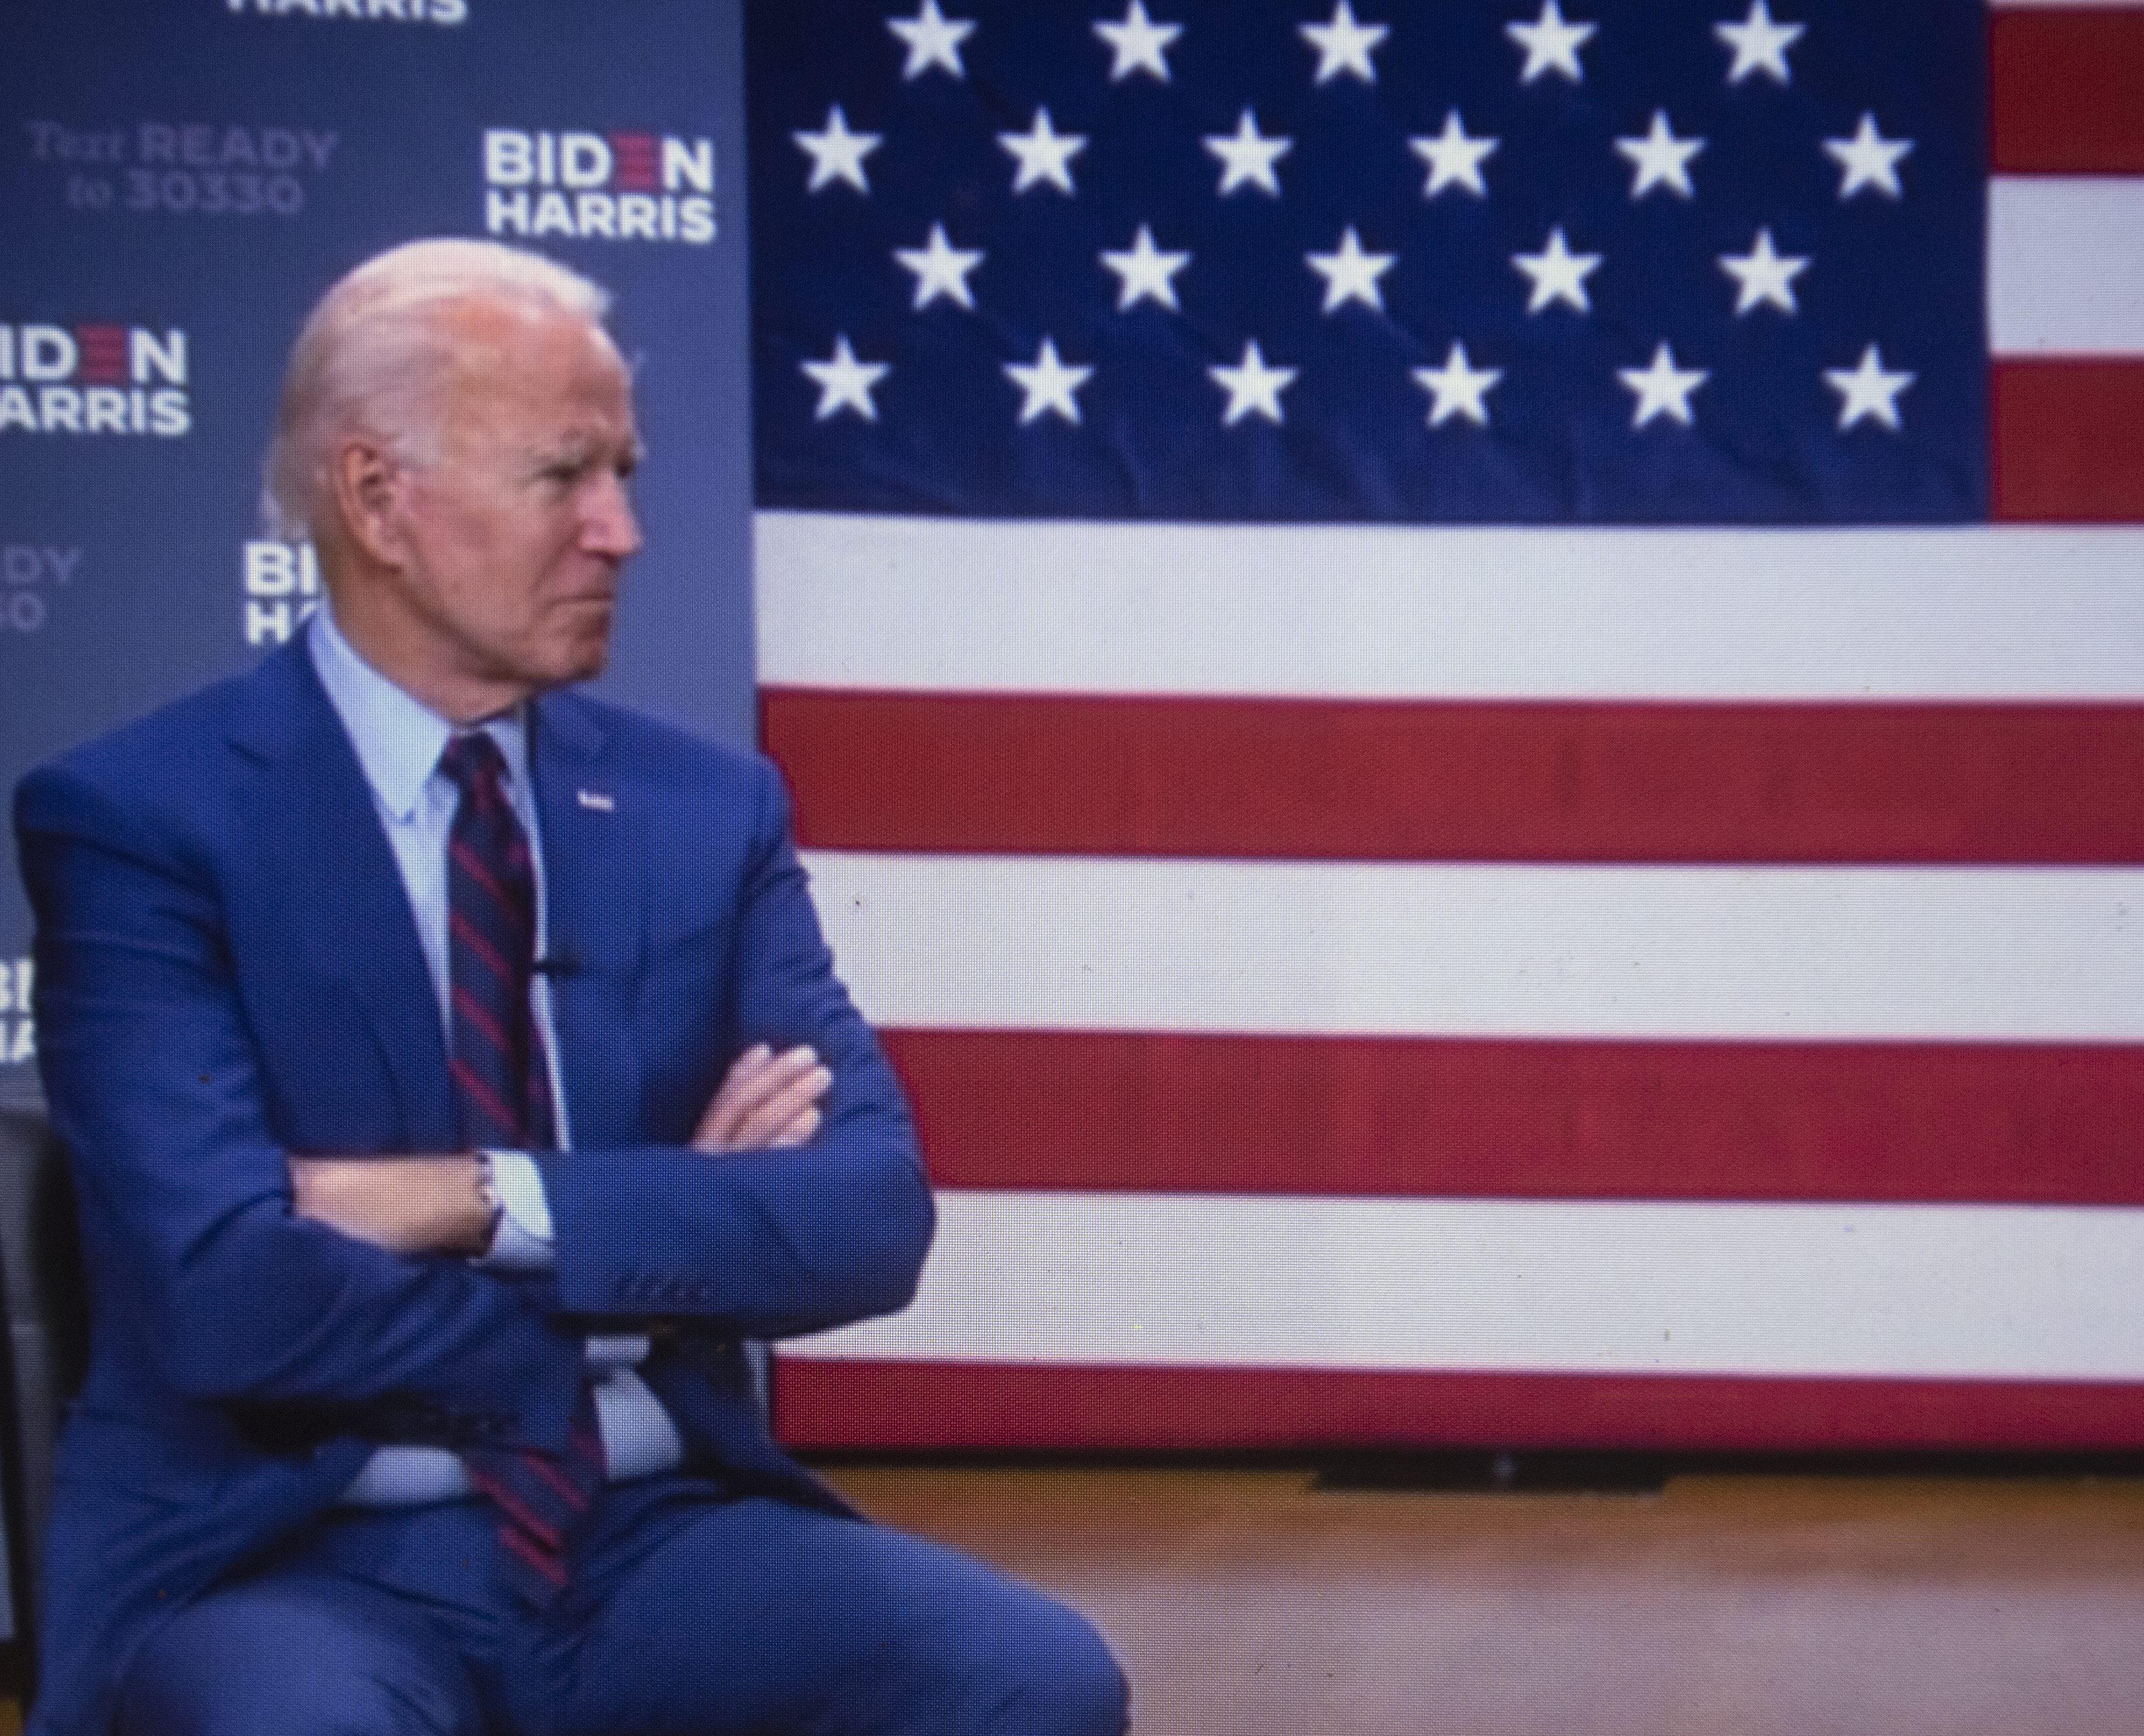 Dwayne Johnson My conversation with Joe Biden and Kamala Harris